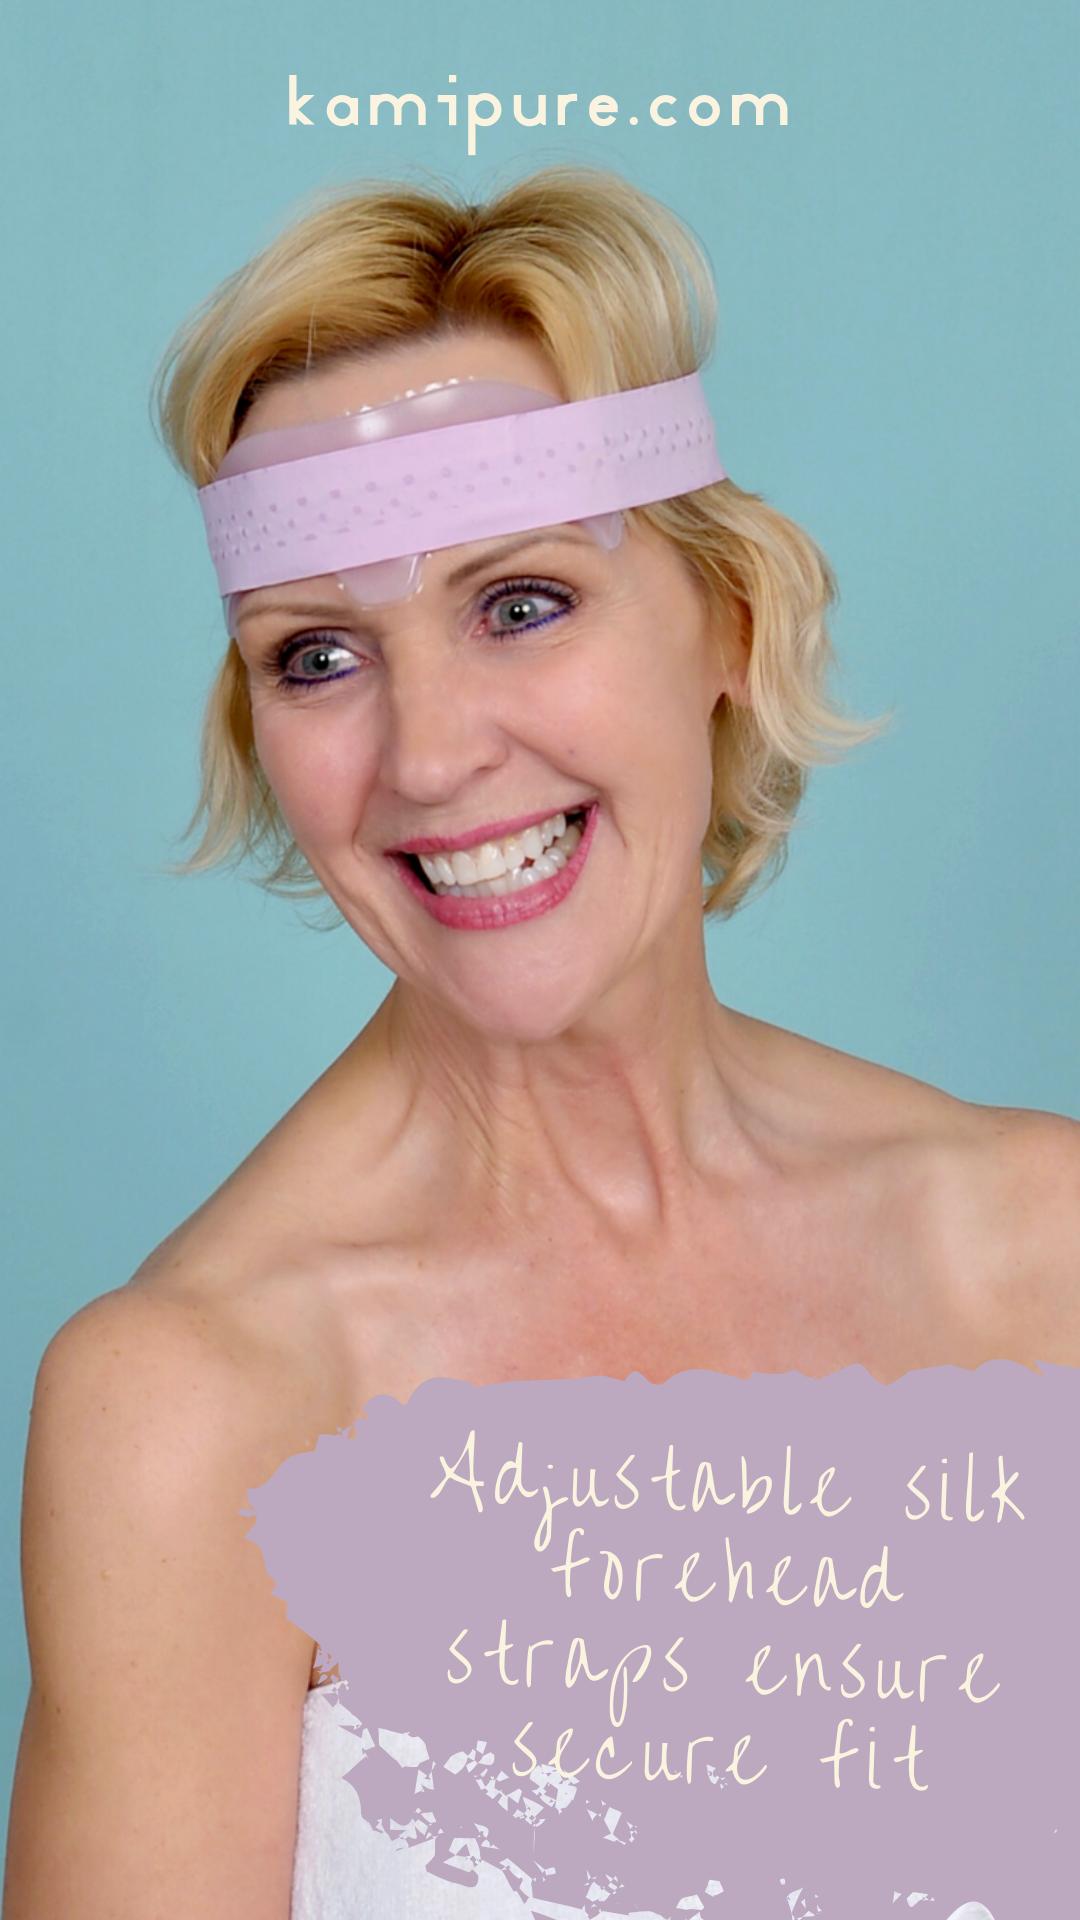 Wrinkle Recovery Forehead Pad Wrinkle treatment, Wrinkle